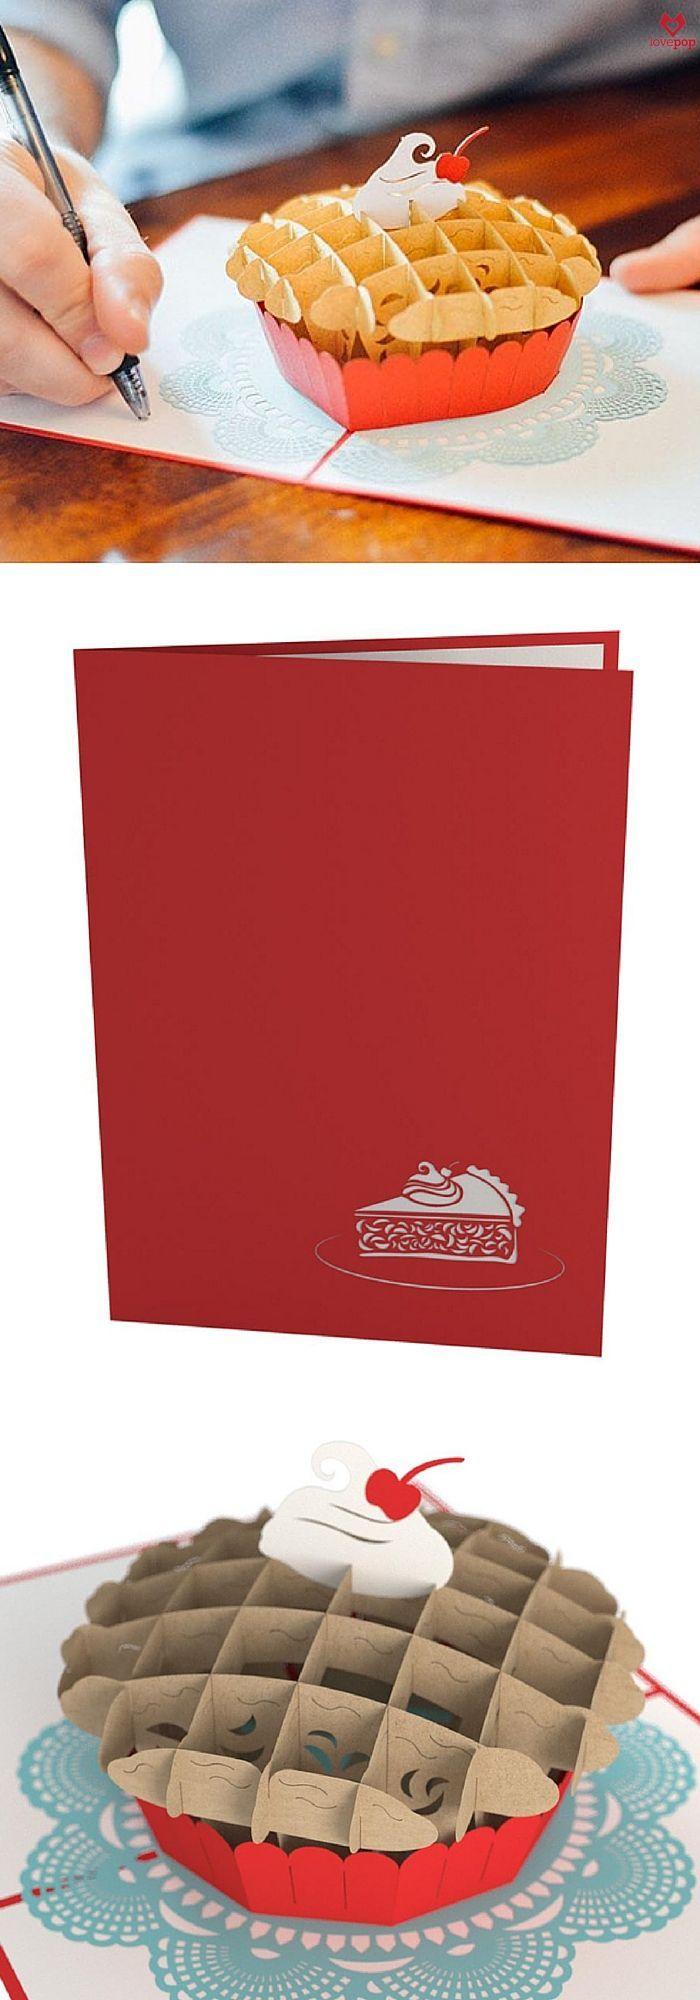 Scrapbook ideas pop up - Cherry Pie